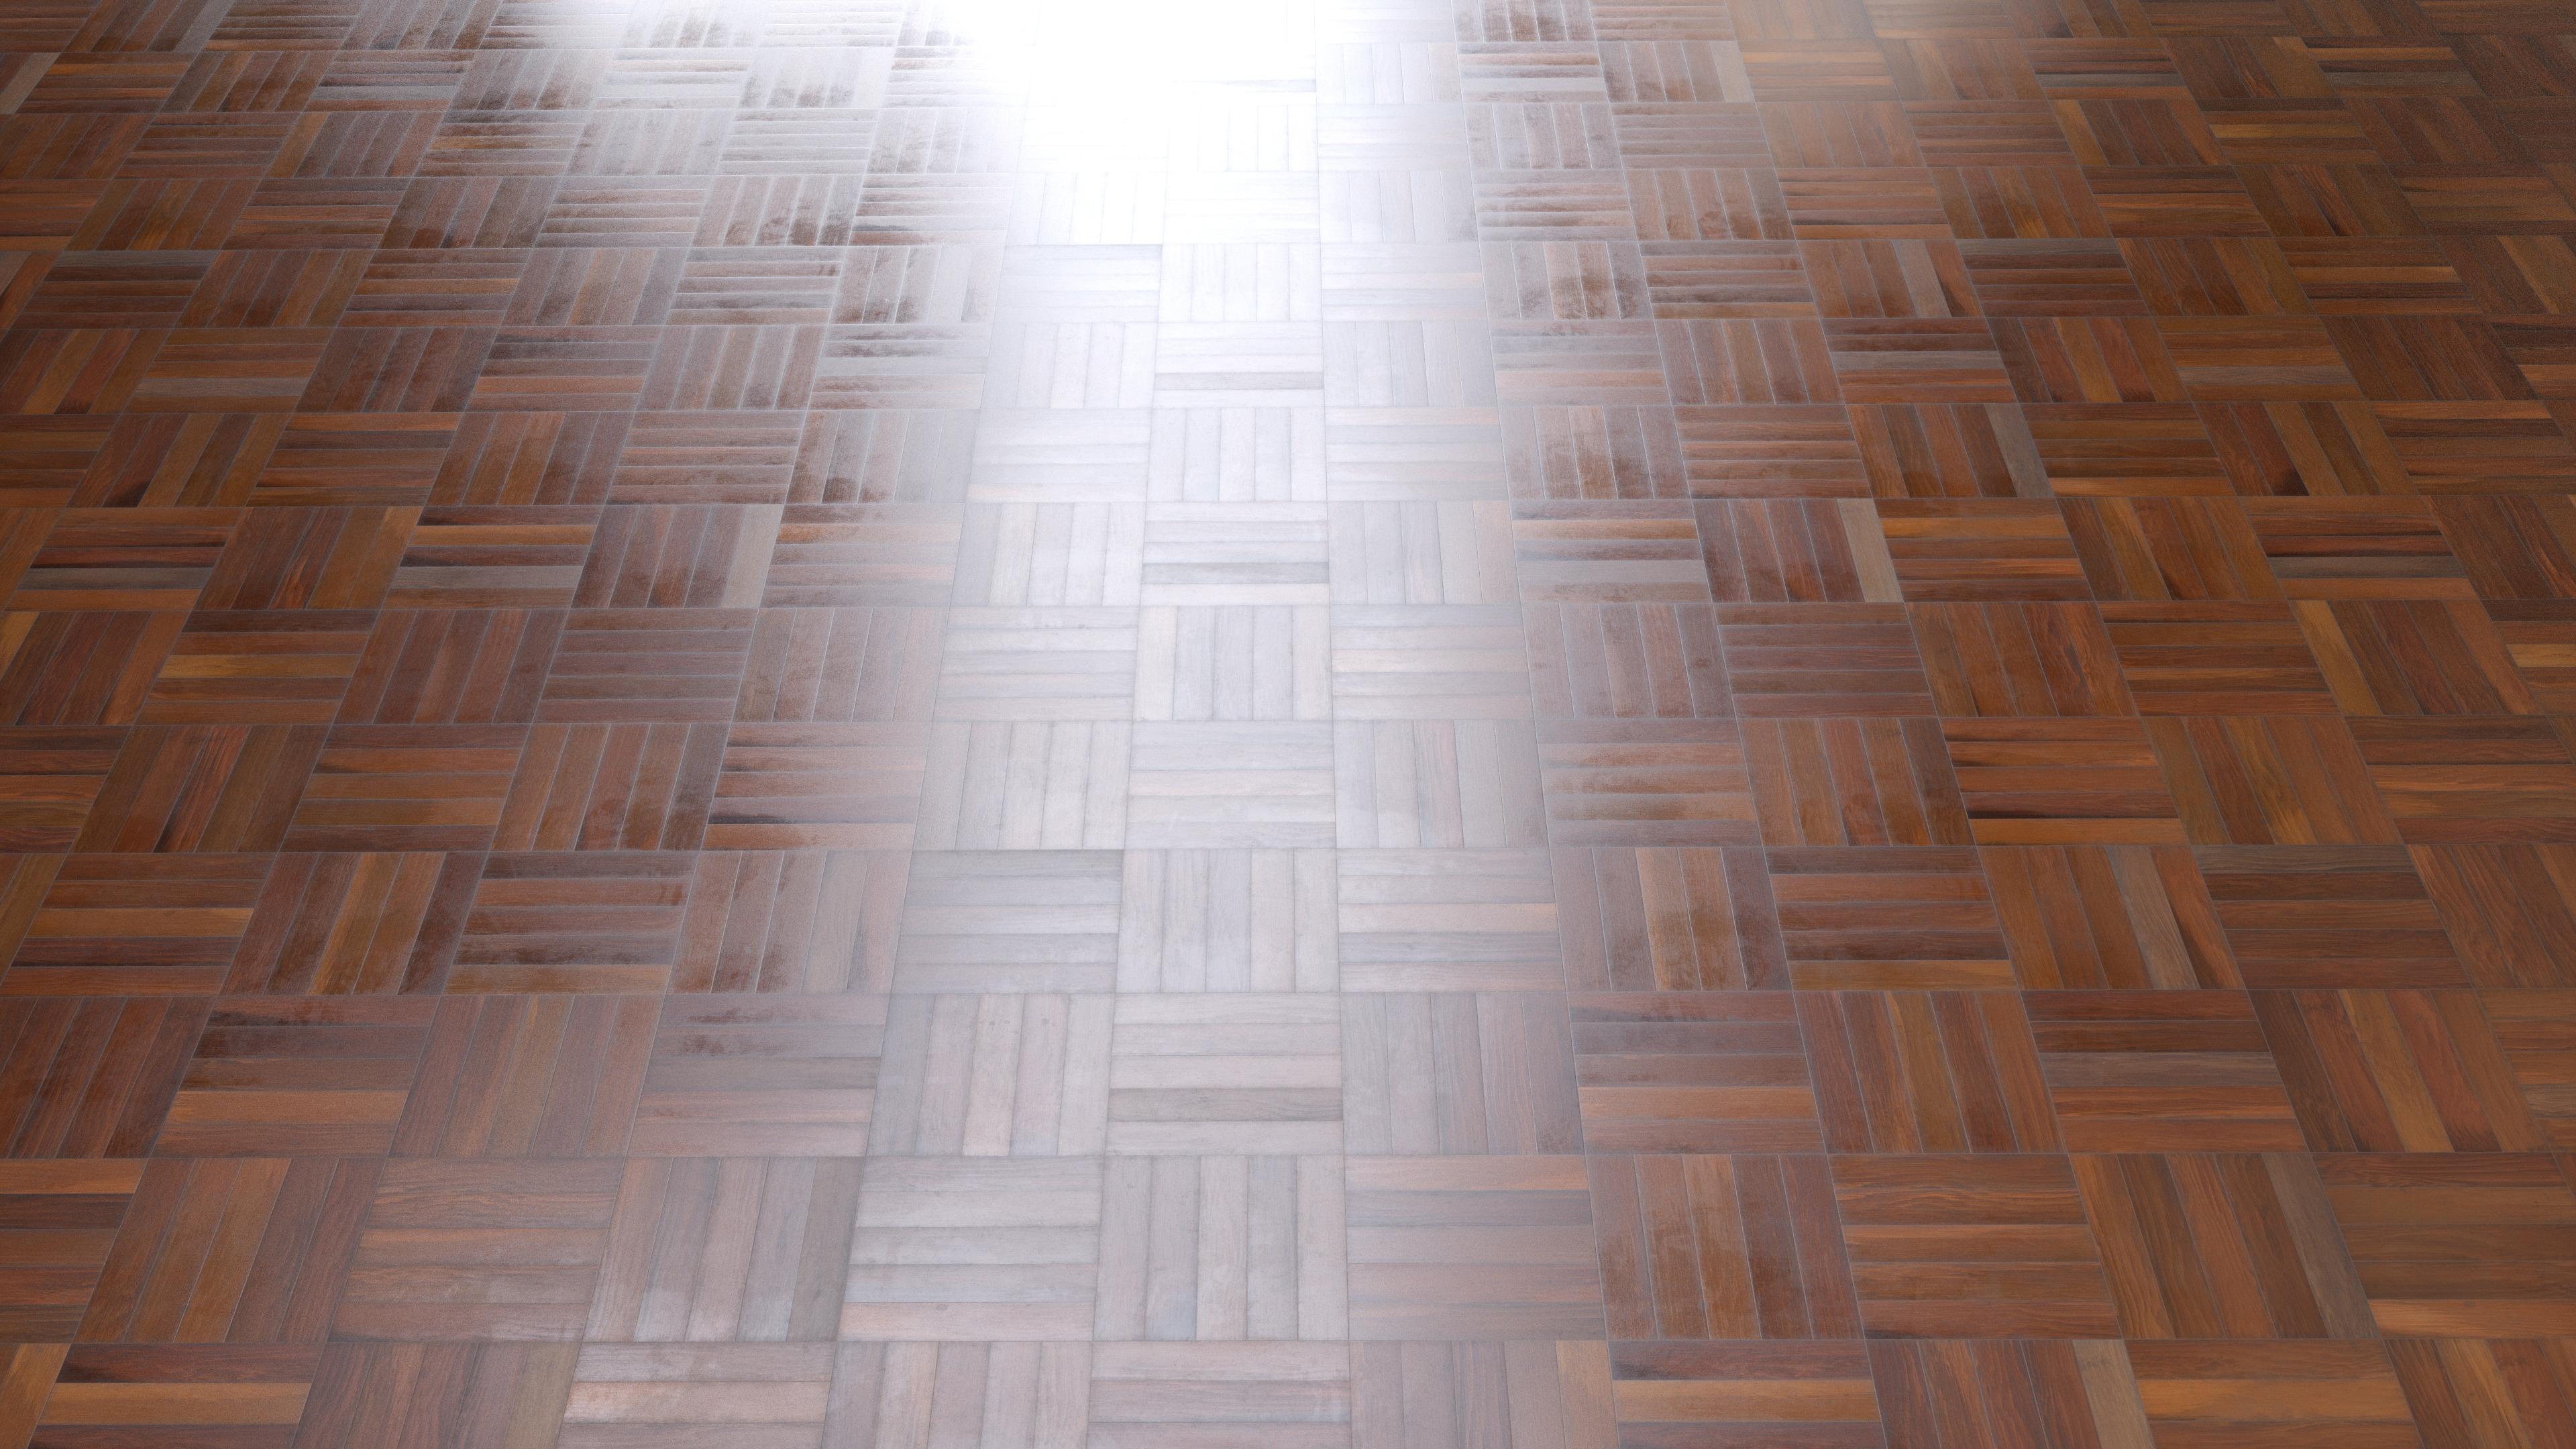 Free Material - Five Finger Parquet Hardwood Floor - PBR0032